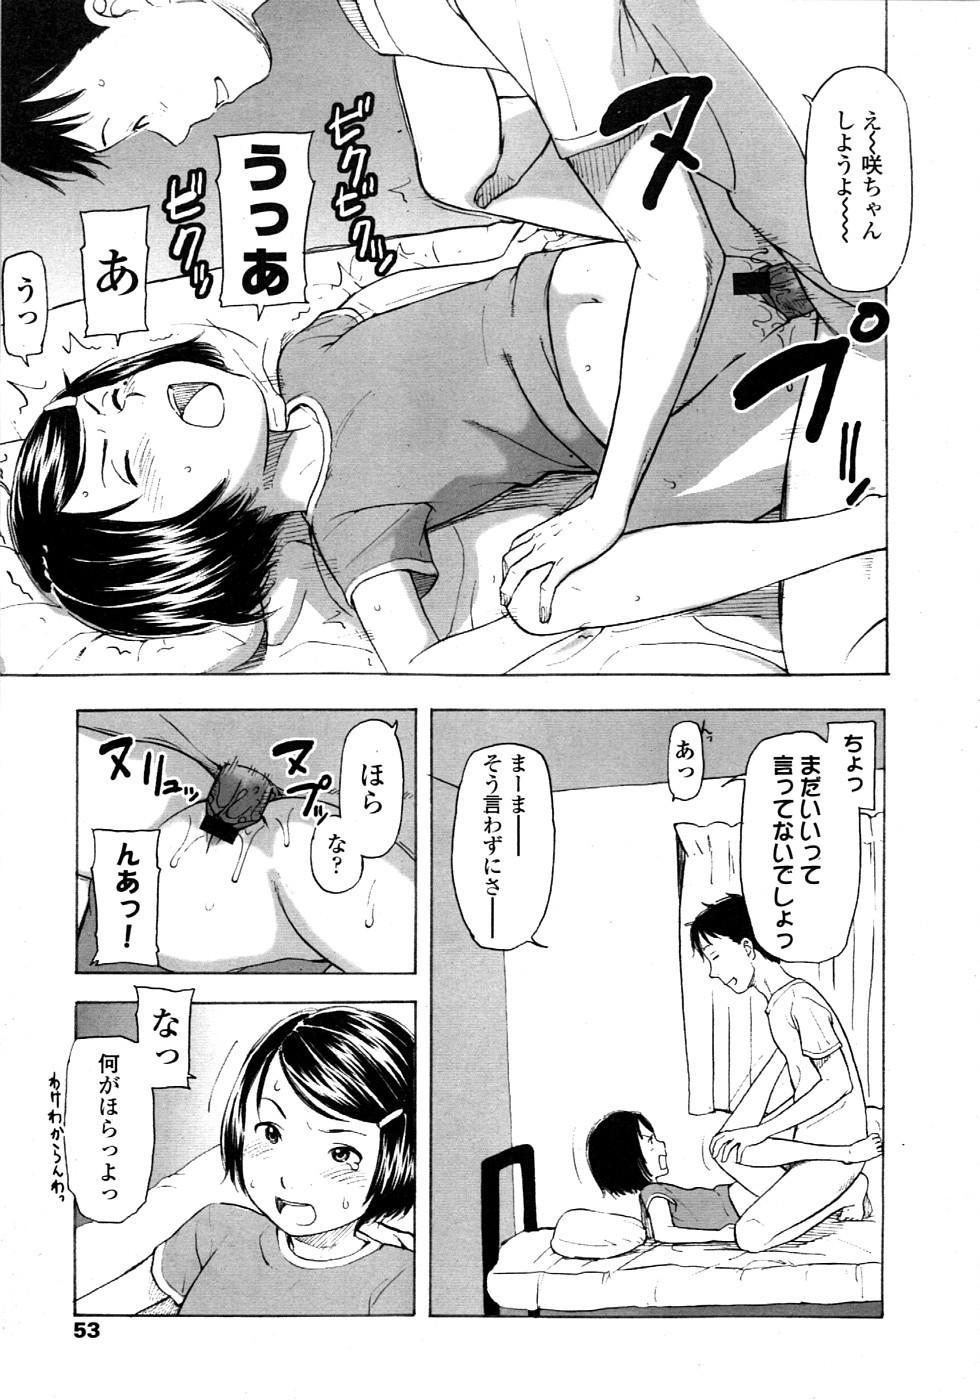 Comic LO 2008-11 Vol. 56 52